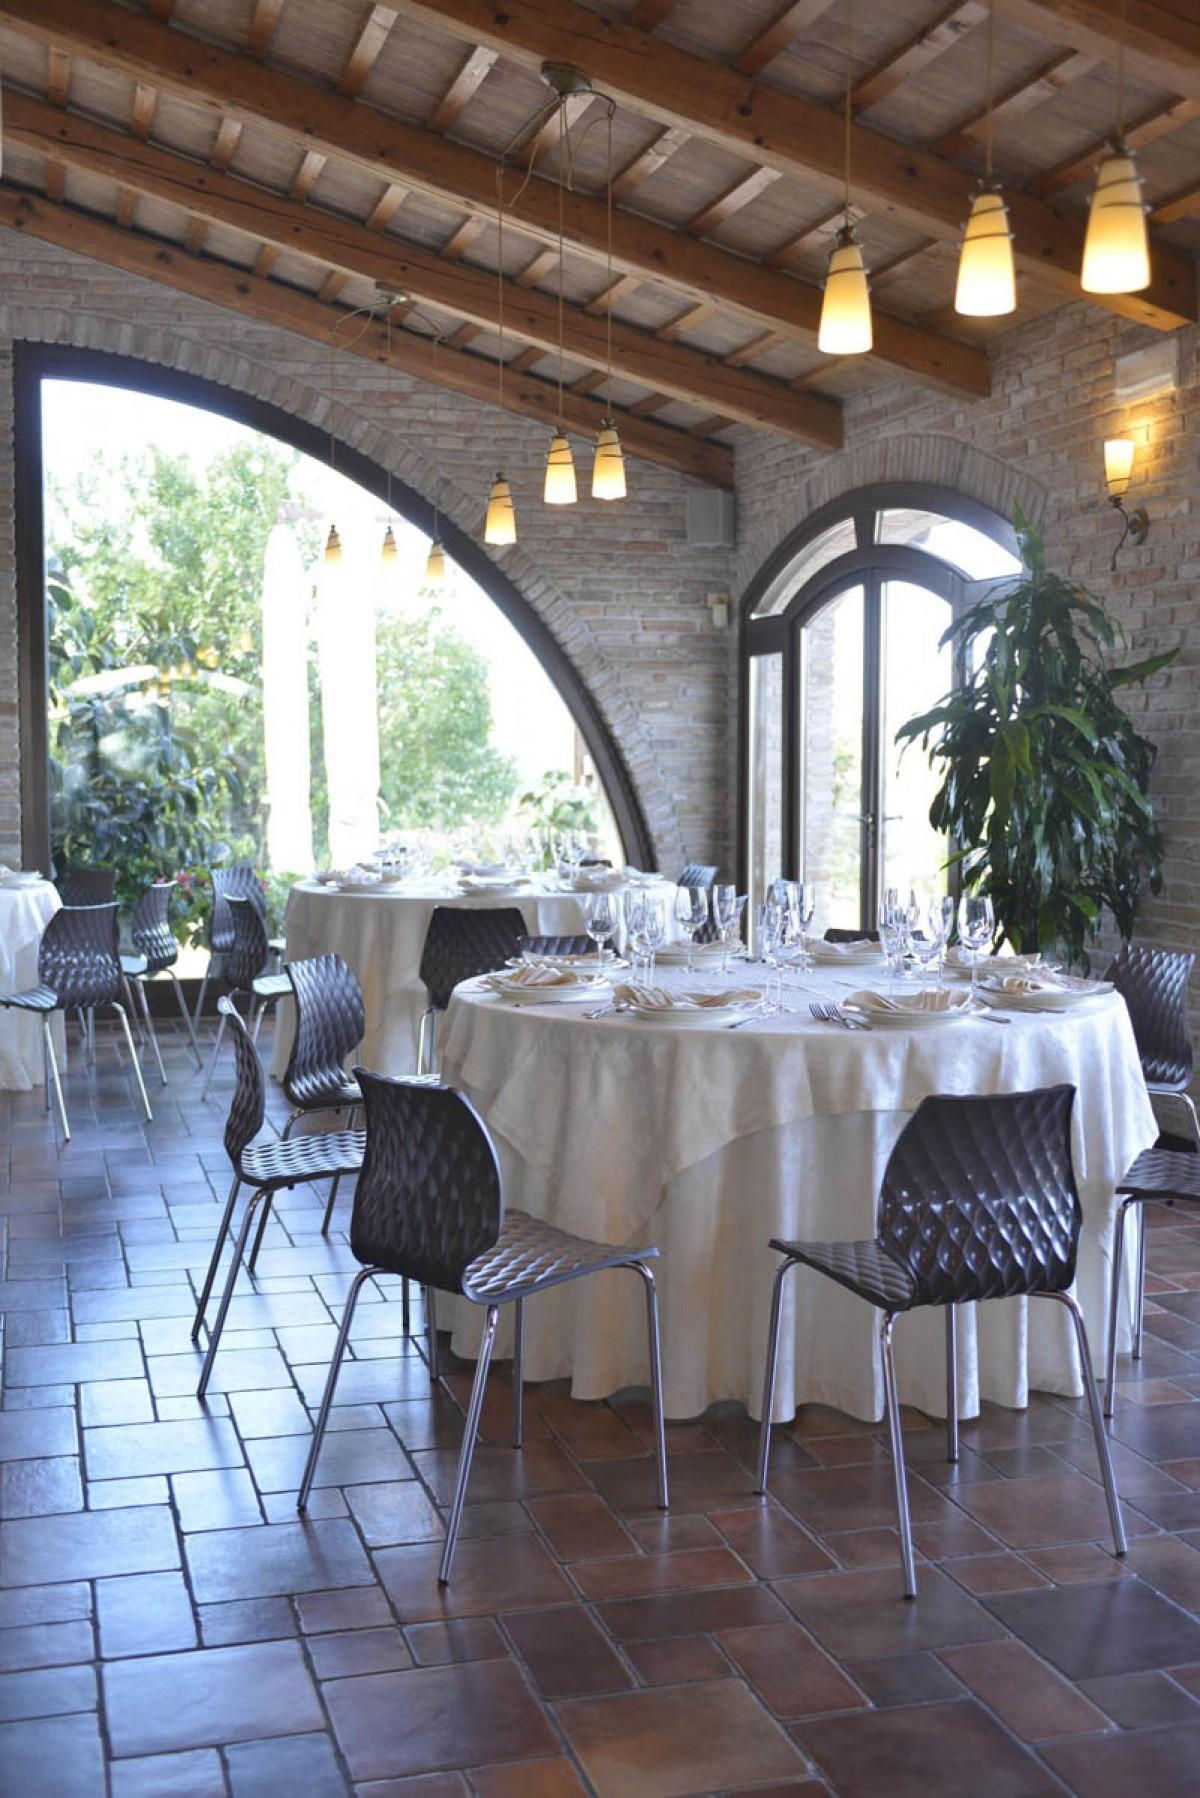 Uno 550 restaurant meubilair p m furniture horeca for Meubilair horeca